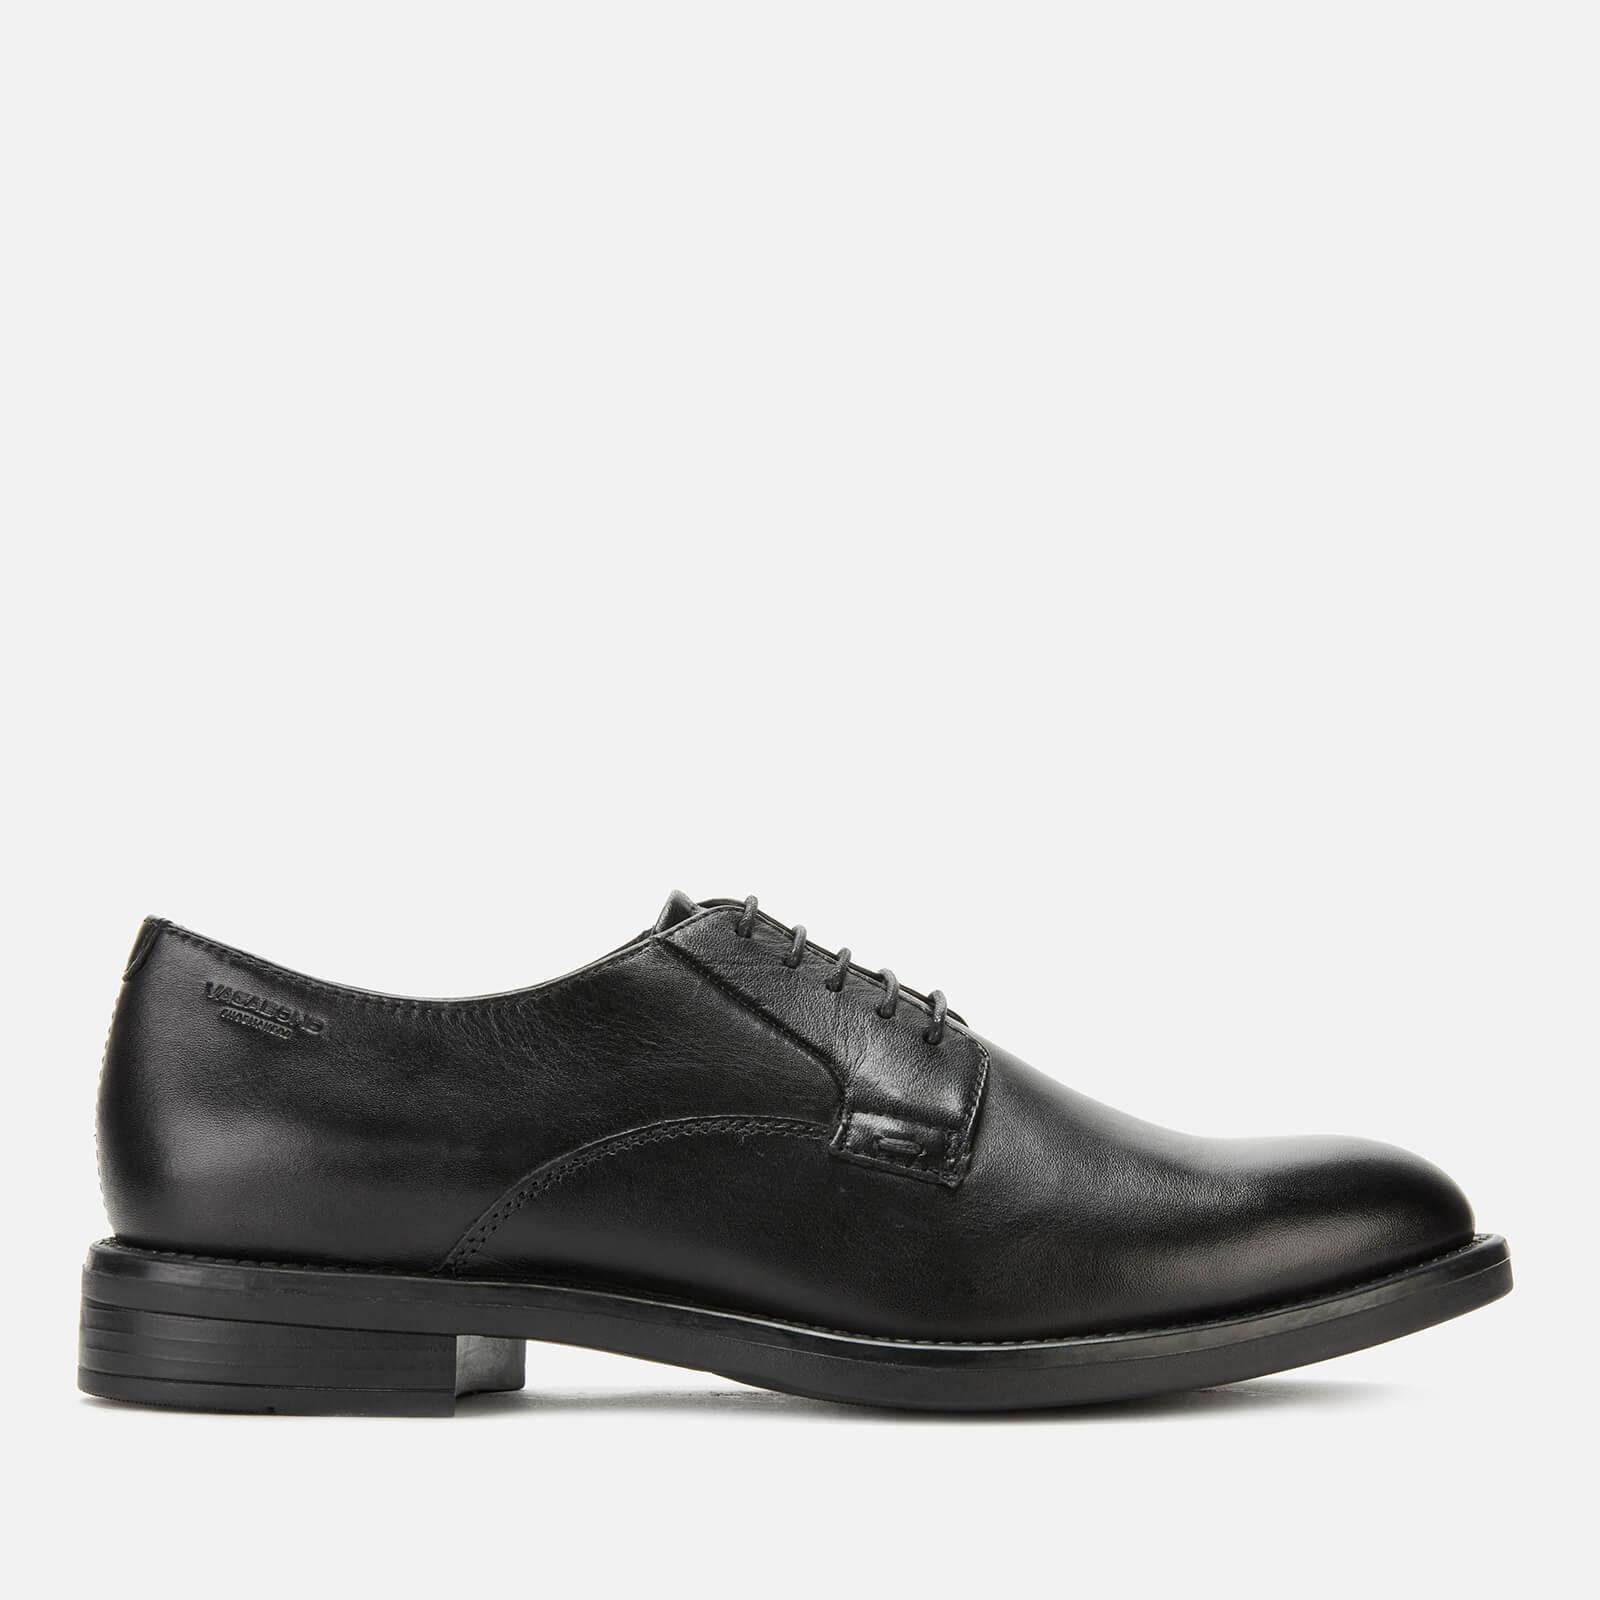 Vagabond Women's Amina Leather Derby Shoes - Black - UK 5 - Black